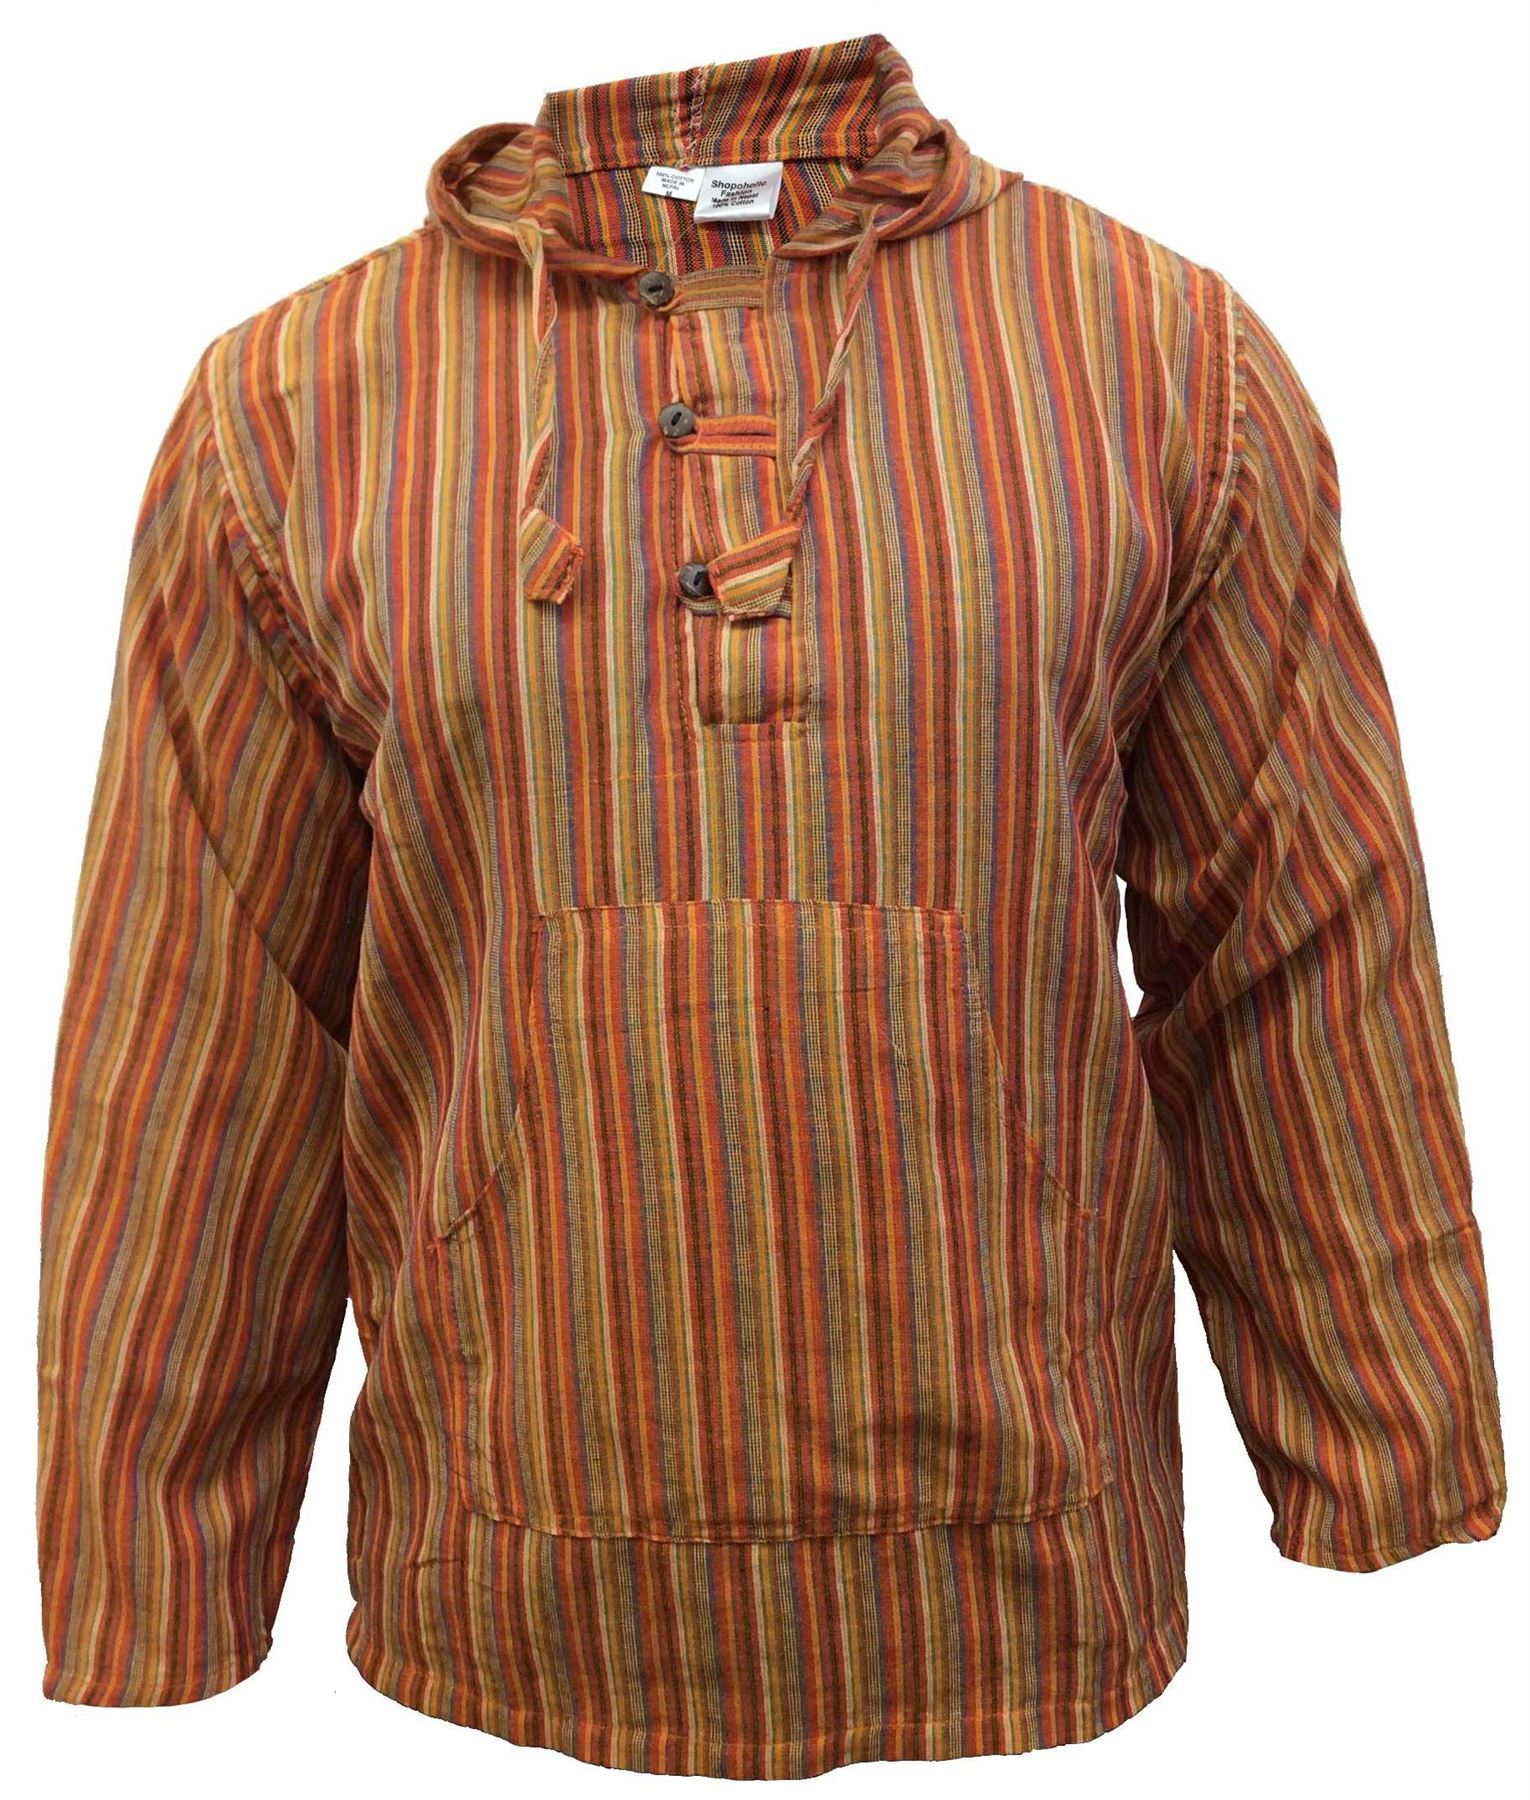 Men-039-s-Cotton-Grandad-Shirt-Full-Sleeved-Hippie-Top-Festival-Stripe-Hippy-Hoodie thumbnail 23